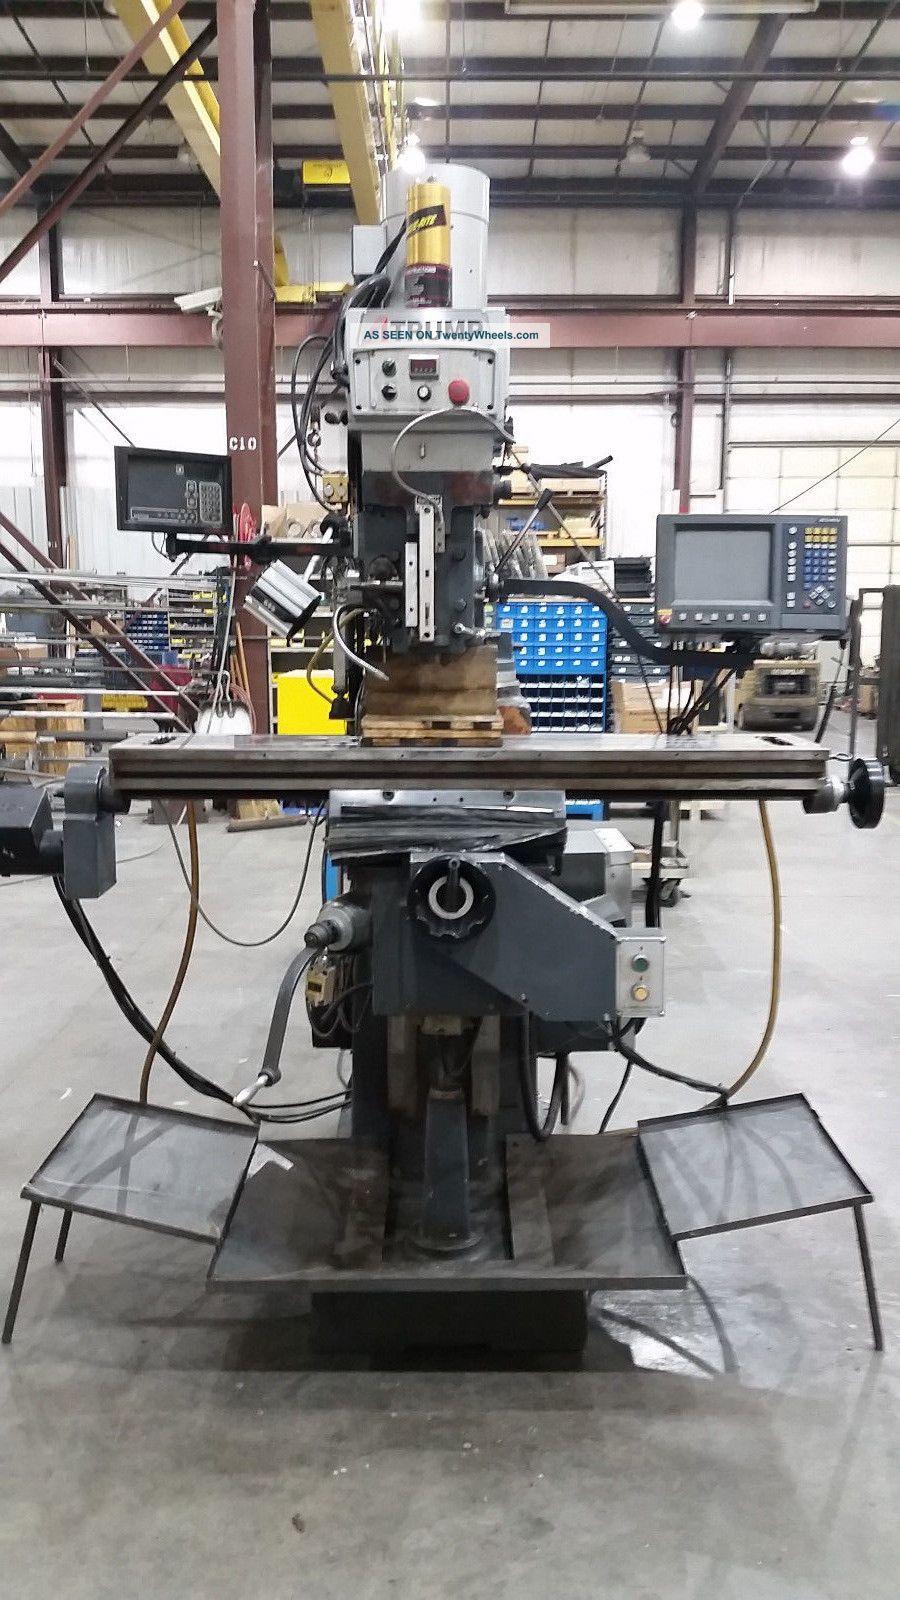 Atrump Cnc Knee Mill Milling Machines photo